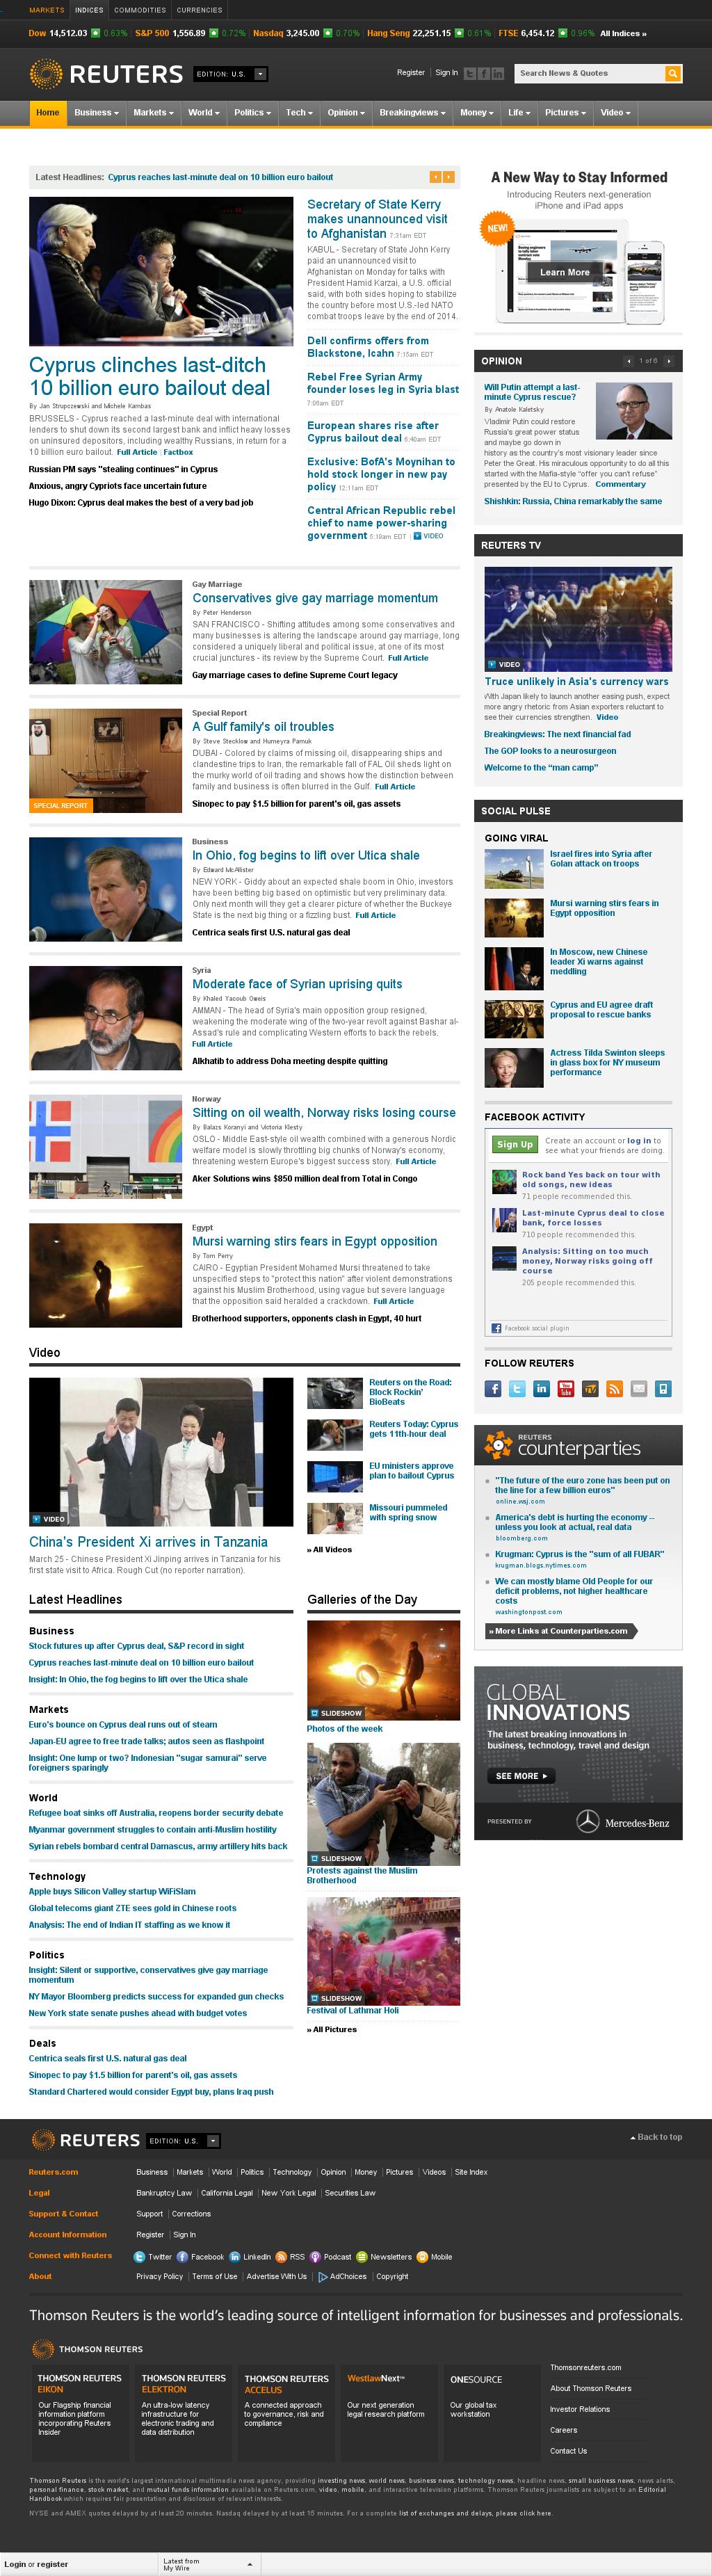 Reuters at Monday March 25, 2013, 11:40 a.m. UTC